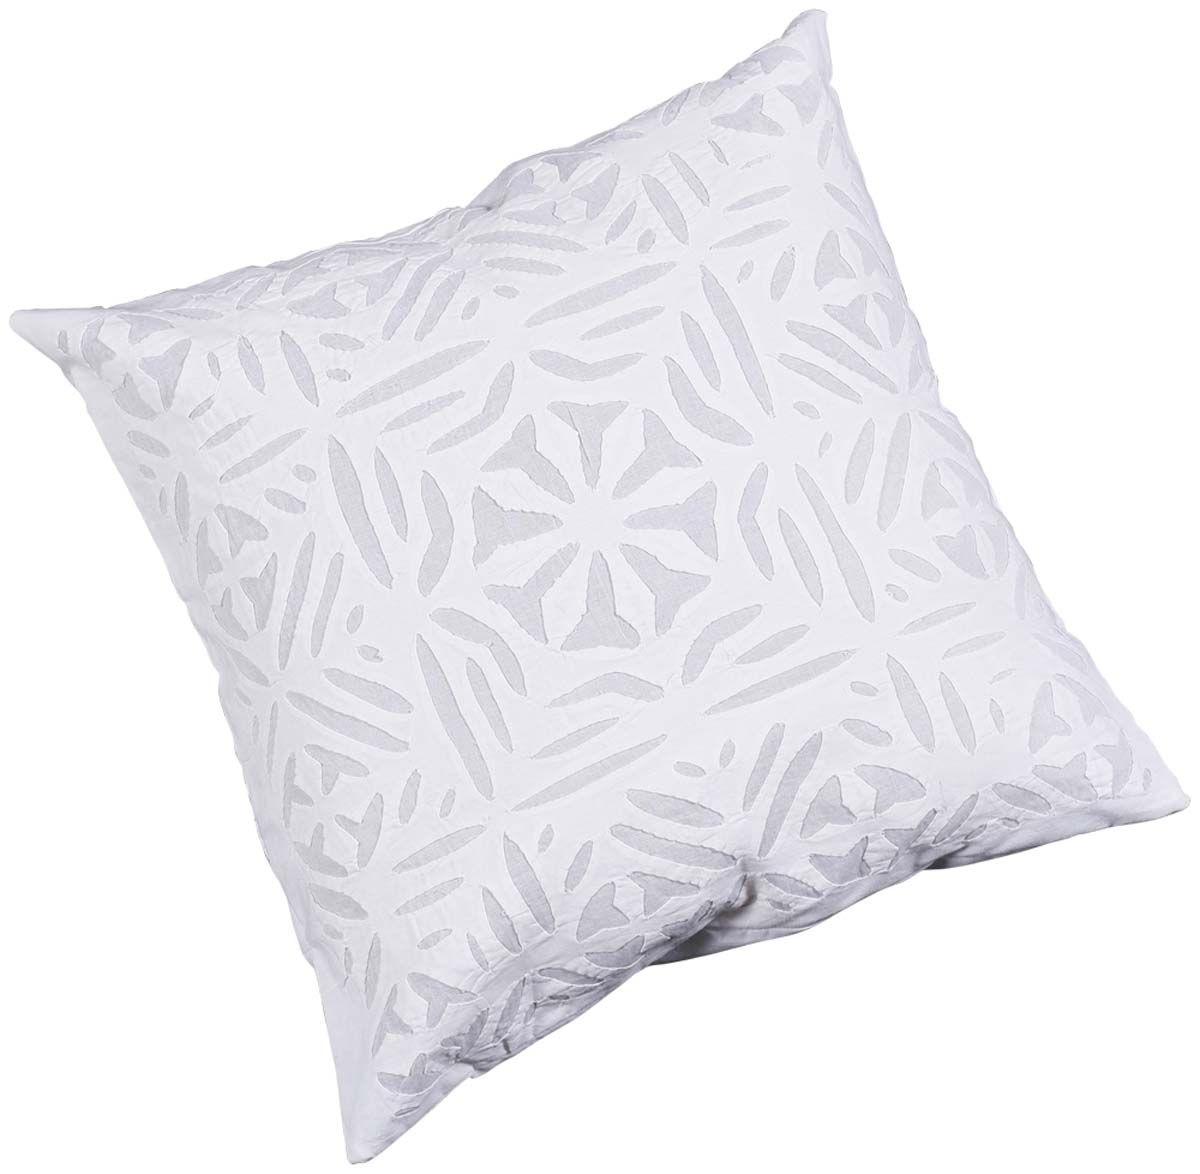 Pin On Bulk Wholesale Cushion Covers Handmade Throw Pillow Covers